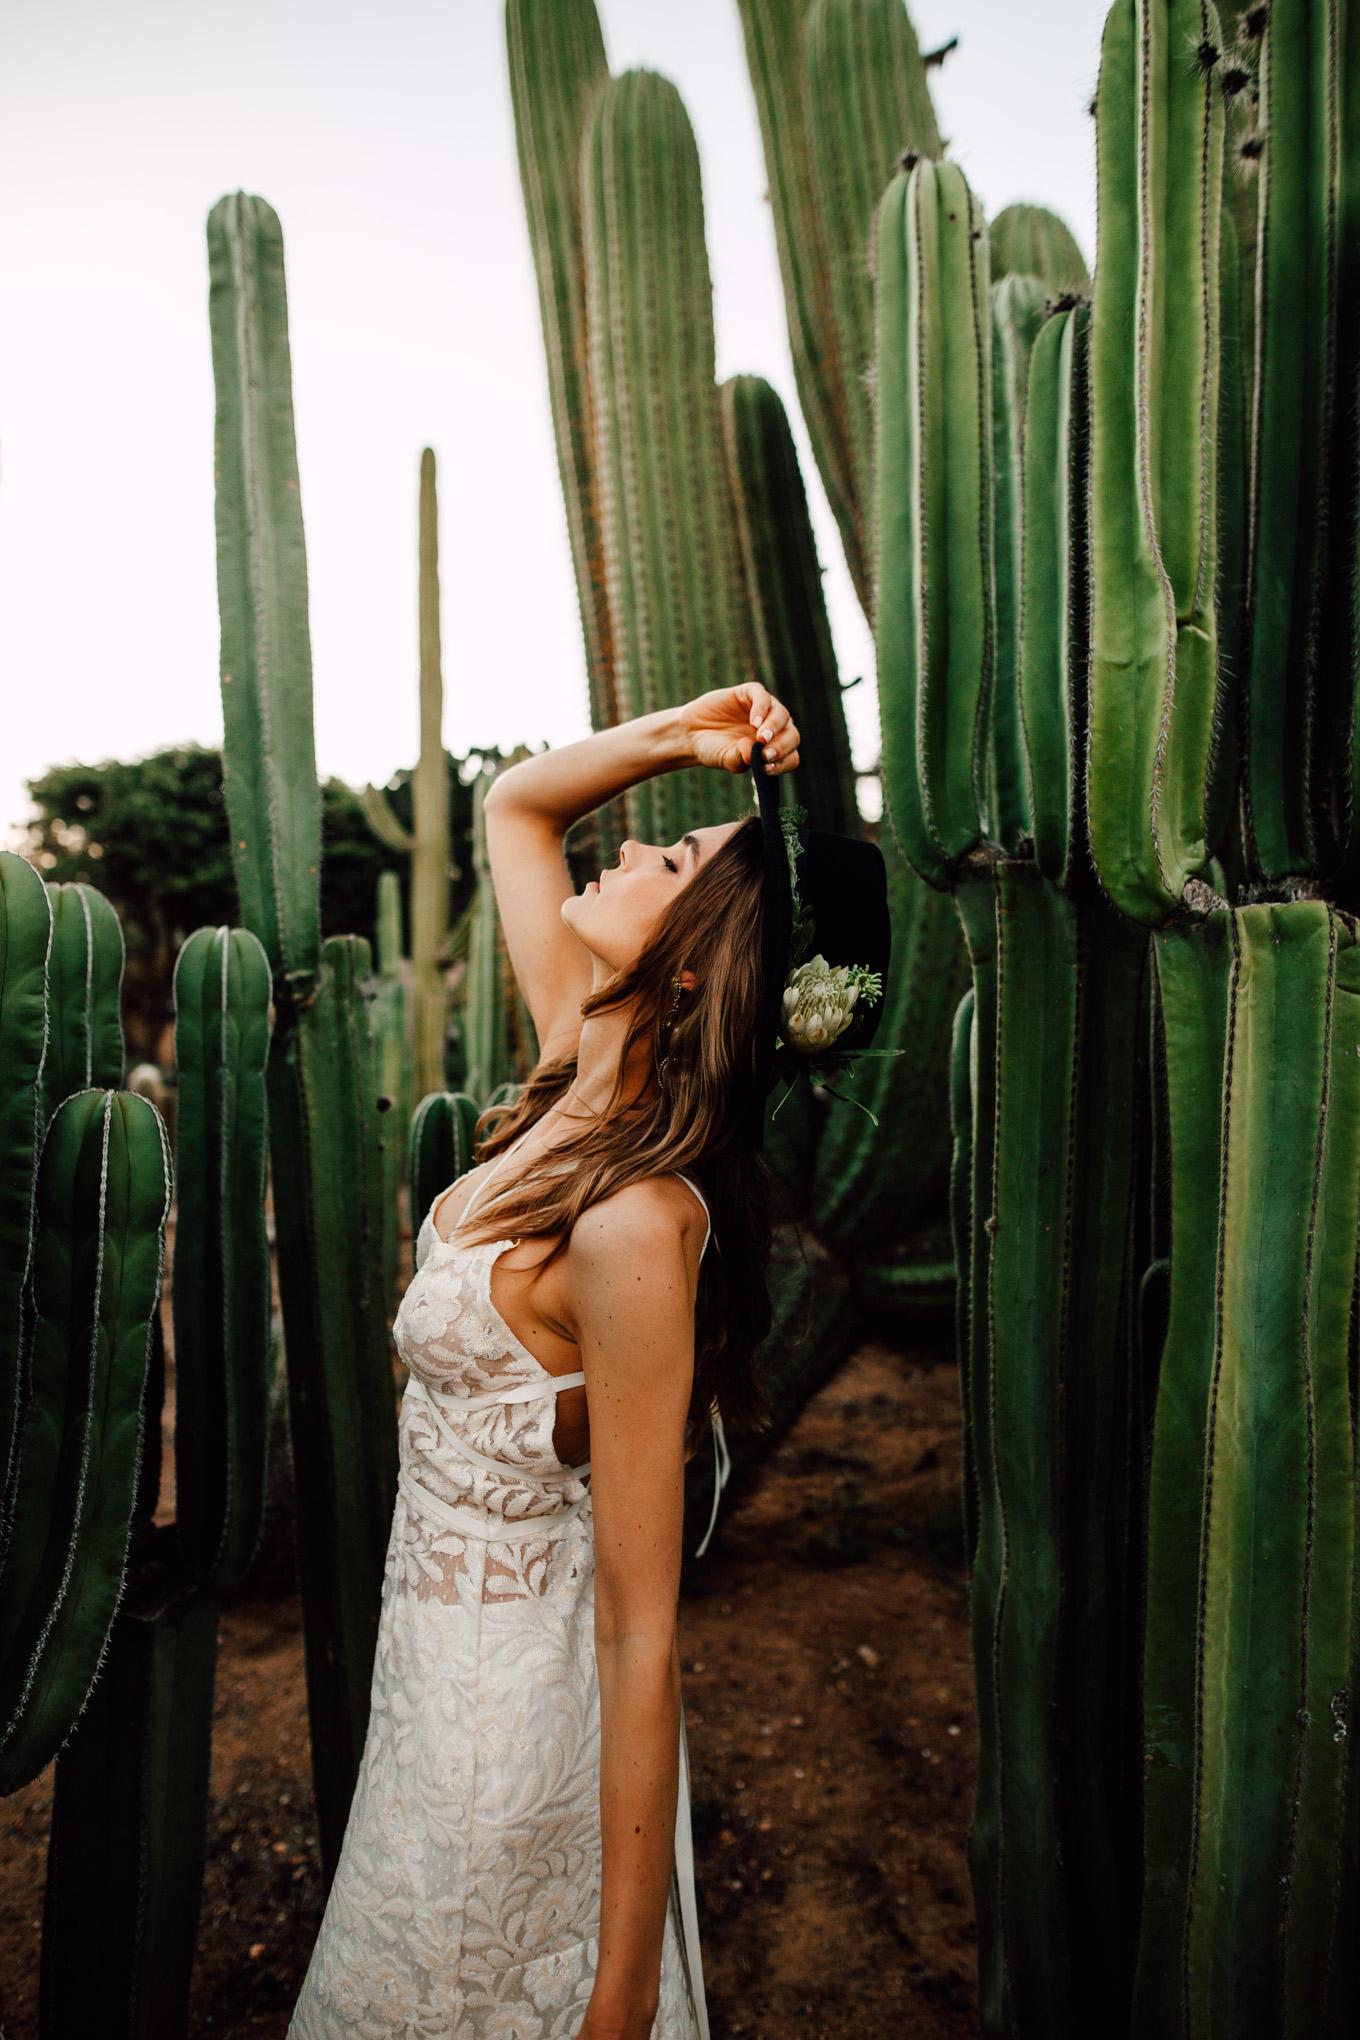 Cape-Town-Pia-Anna-Christian-Wedding-Photography-South-Africa-Bride-Cactus-21.jpg